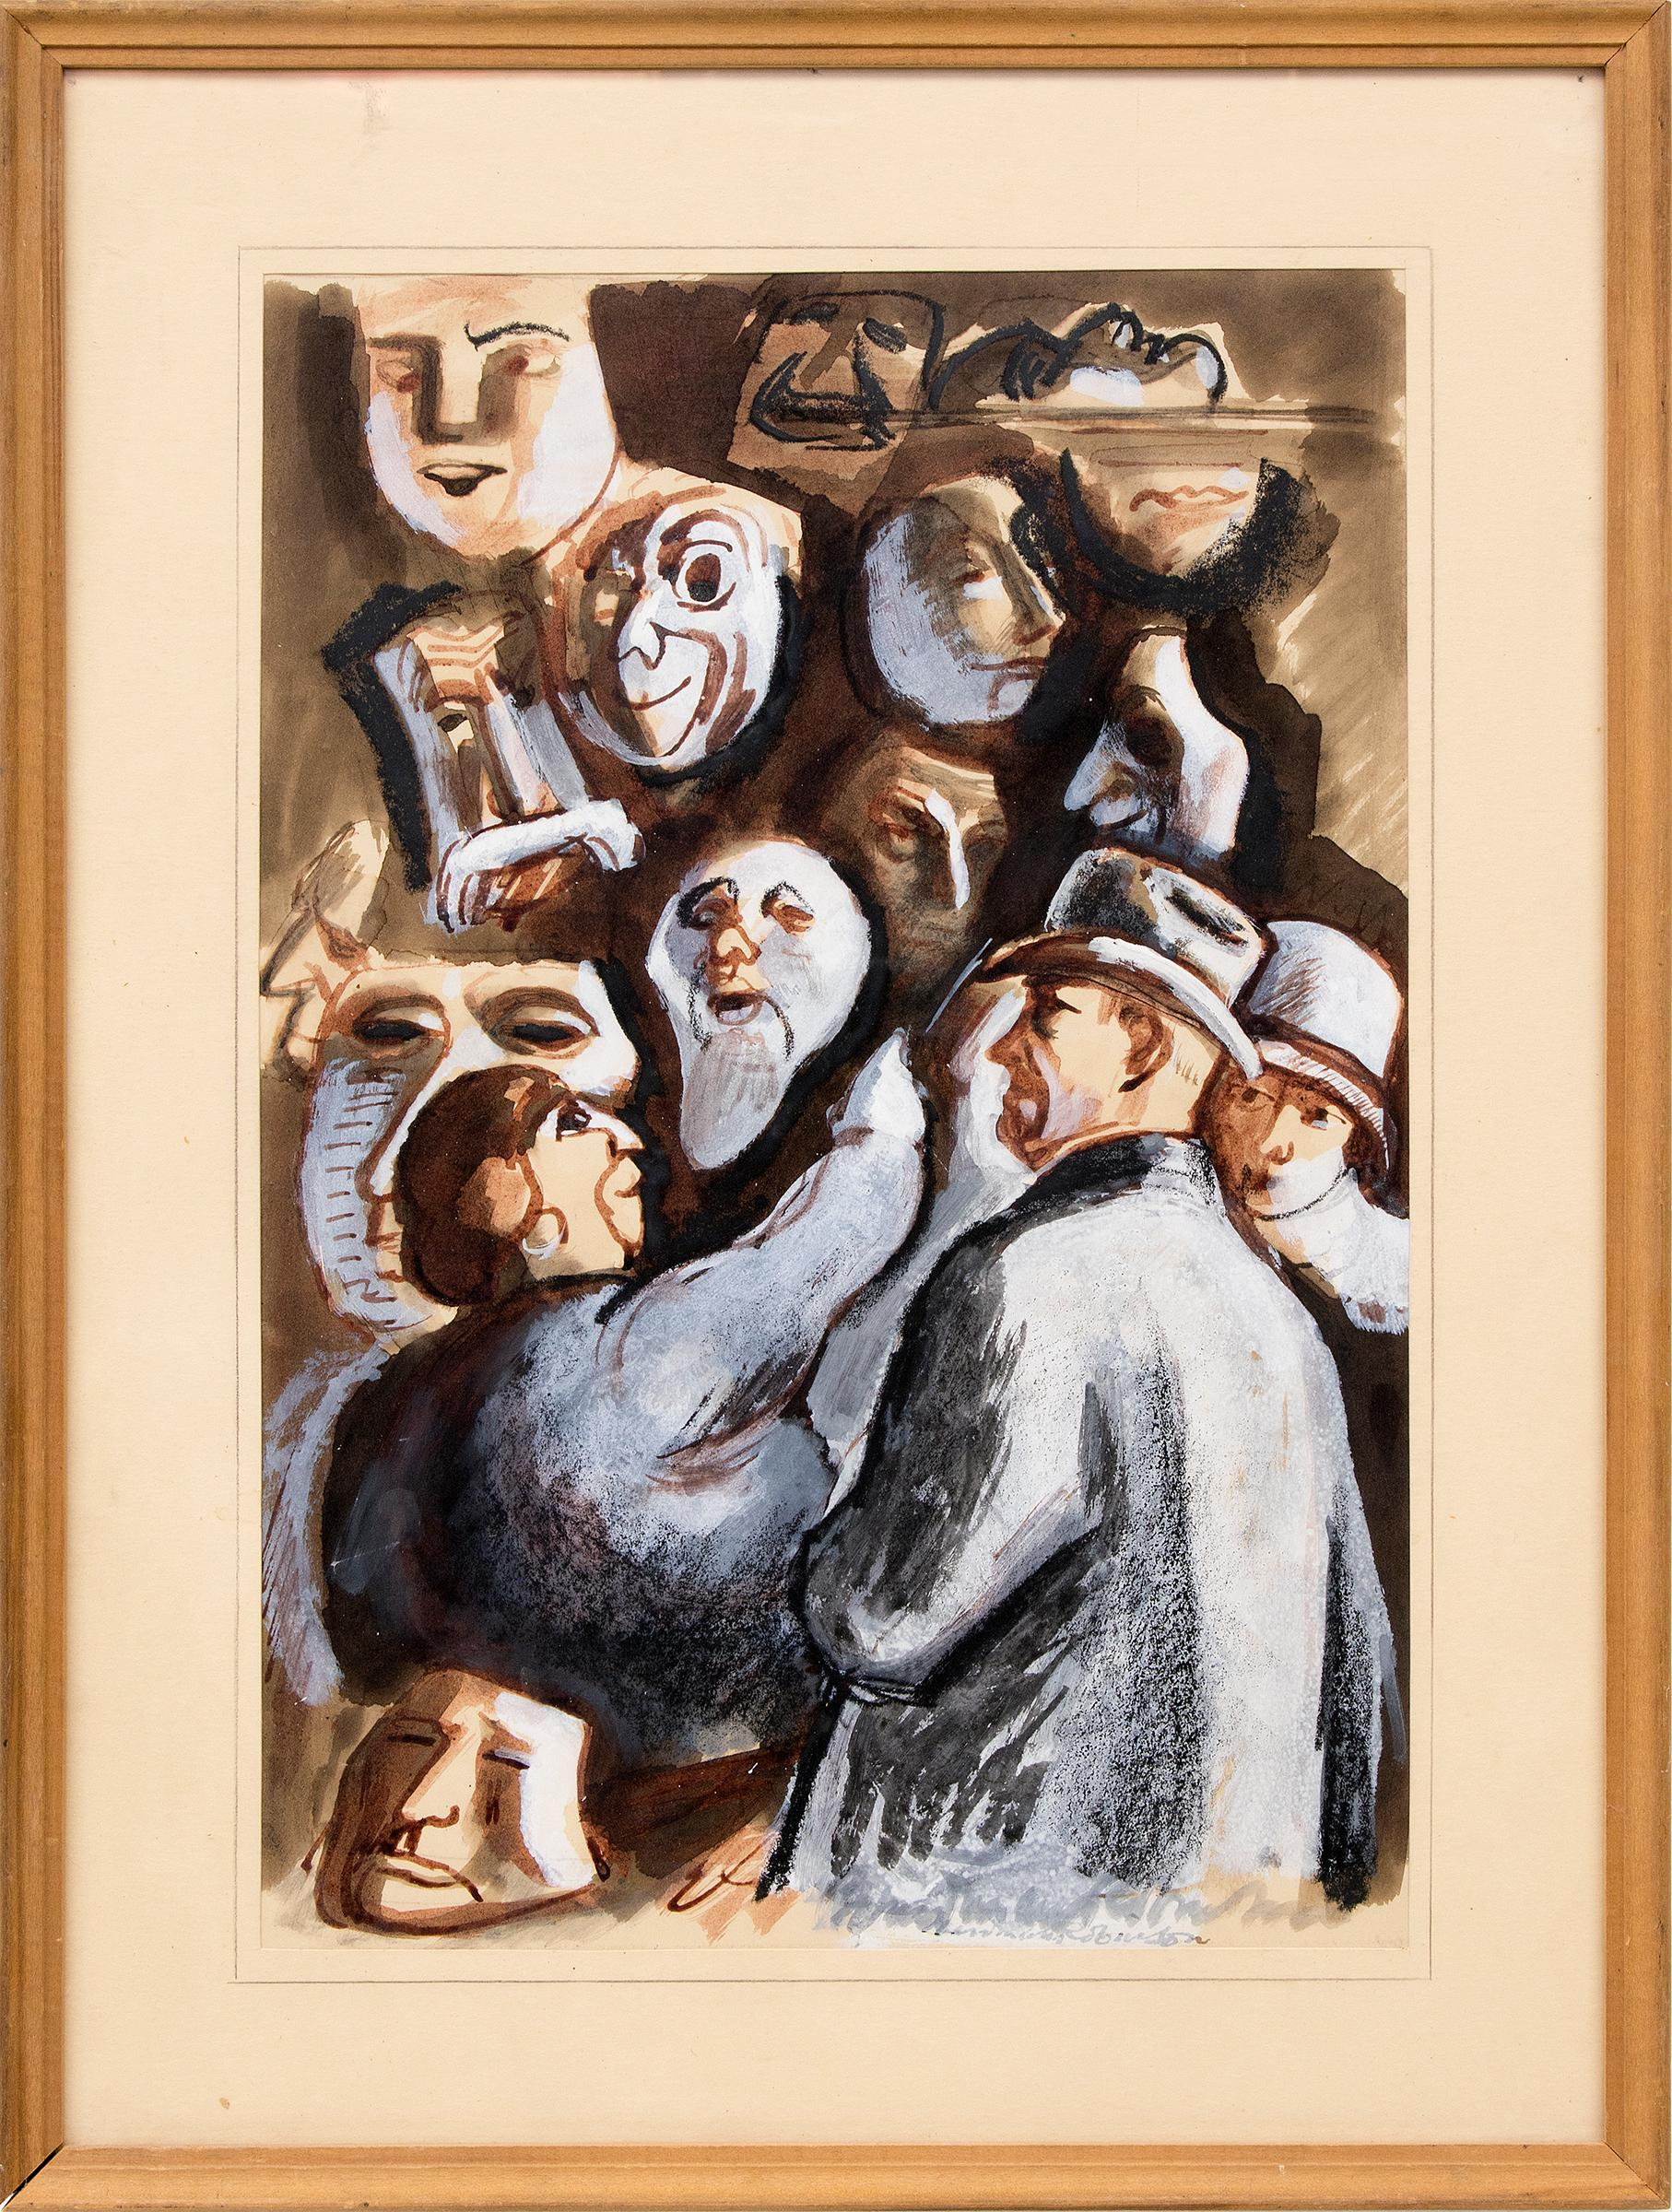 The Vendor of Masques (Masks) Vintage 1930s Modernist Painting Brown White Black